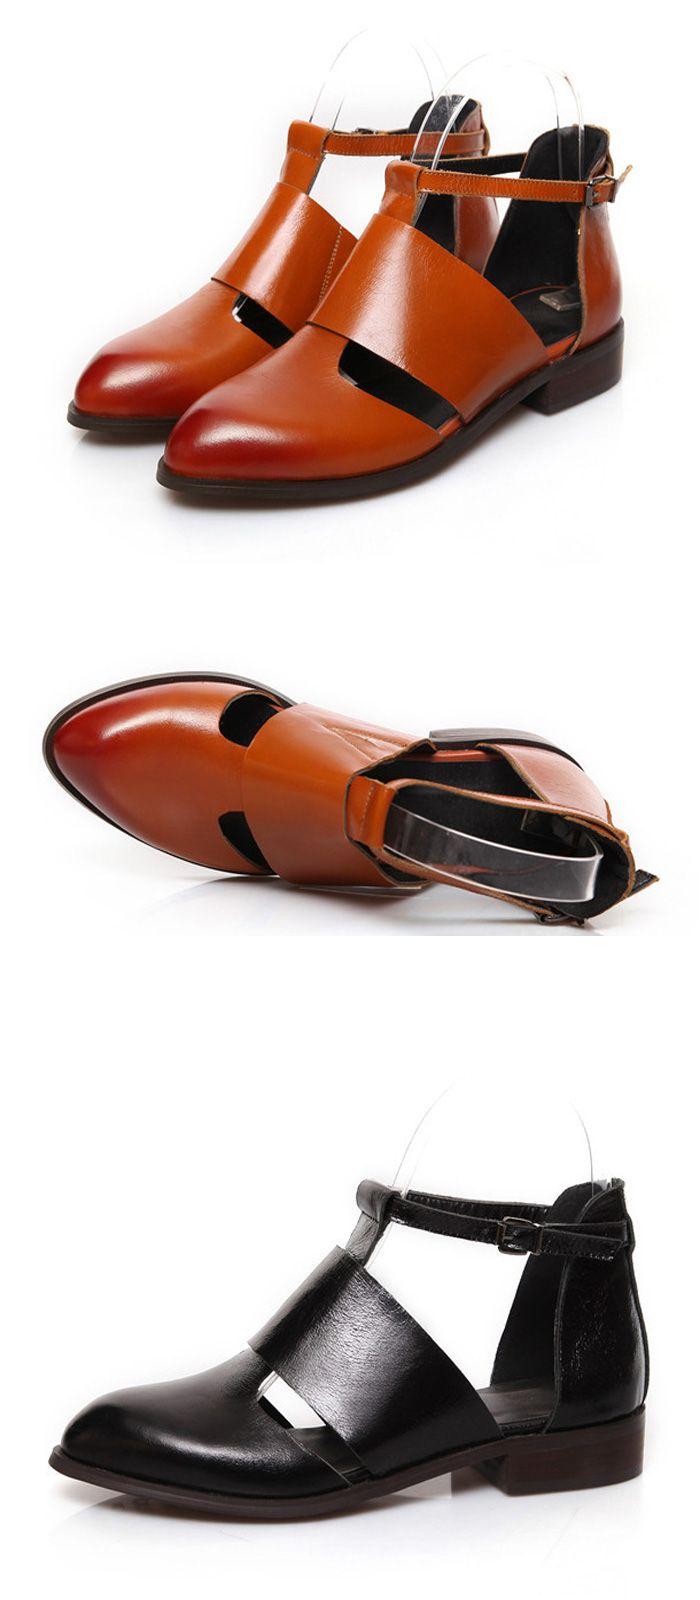 Тренд 2015 года летние сандалии из натуральной кожи, женская обувь http://ali.pub/2fskn 2015 new oxfords genuine leather women's shoes cut out chaussure femme huarache mocassin for woman sapatos femininos flats.